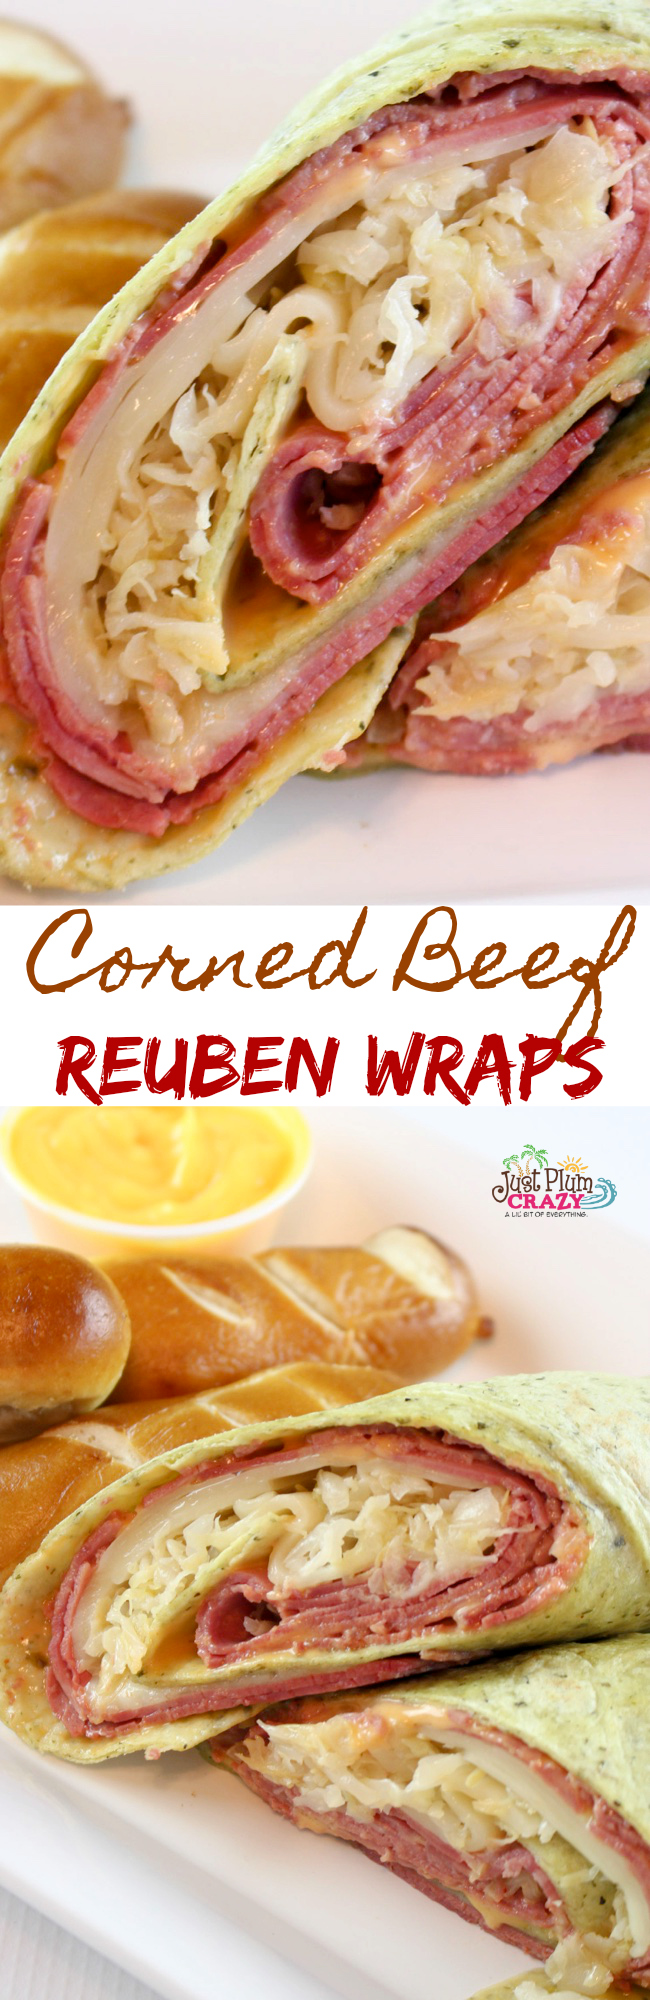 Corned Beef Sandwich Reuben Wrap